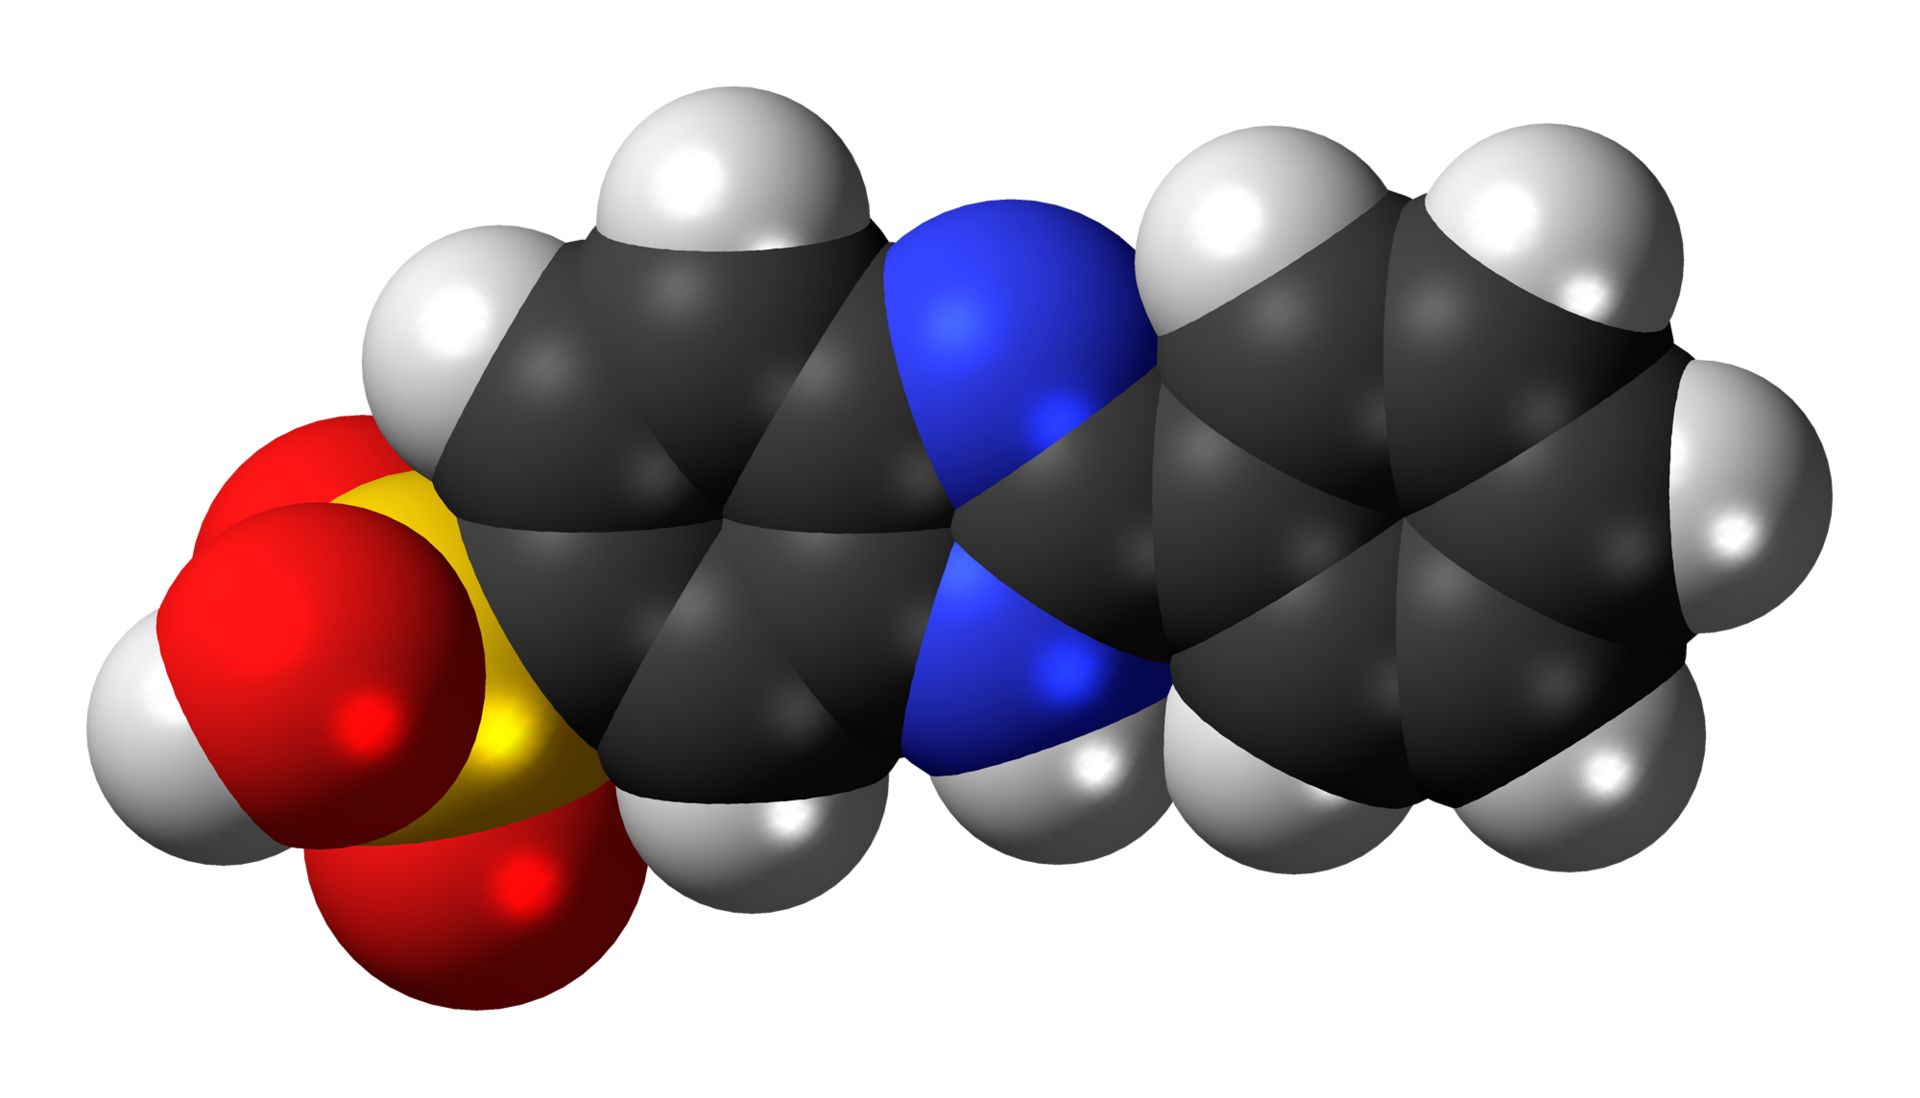 ensulizole - Wikidata